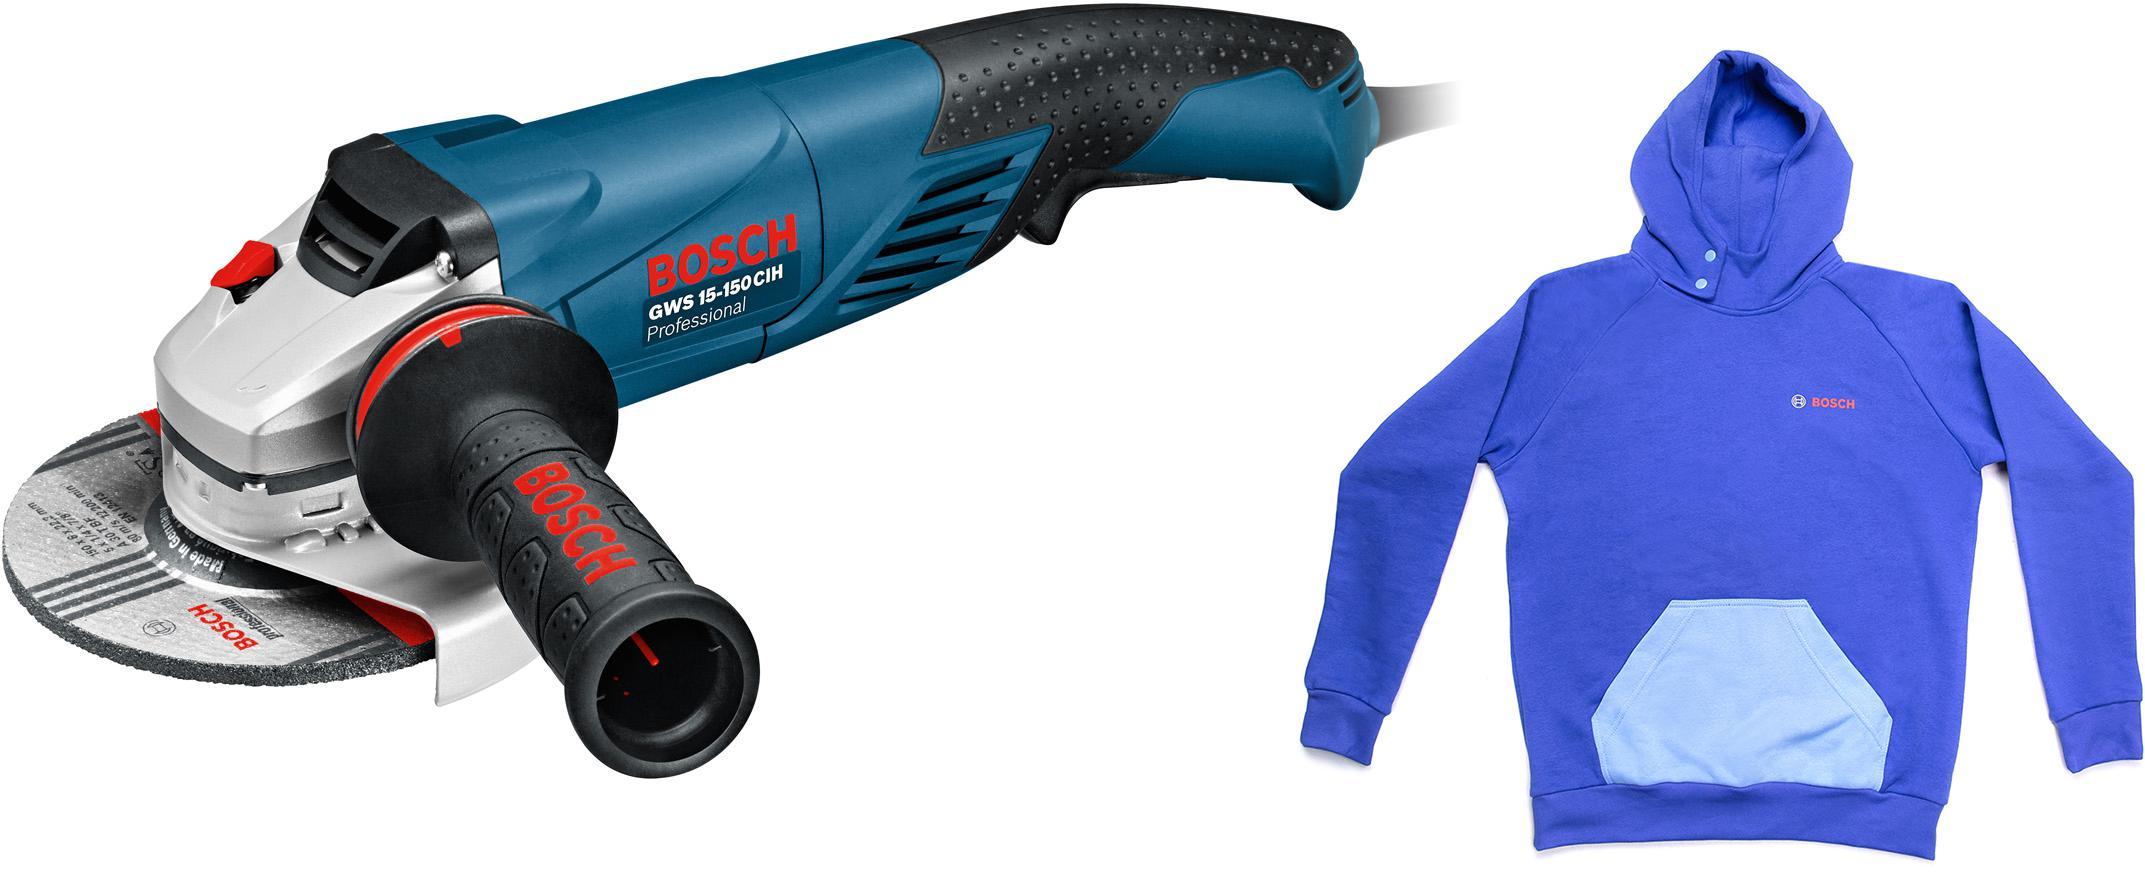 Набор Bosch УШМ (болгарка) gws 15-150 cih (0.601.830.522) +толстовка blue 1619m00u9s углошлифмашина bosch gws 15 150 cih 0 601 830 522